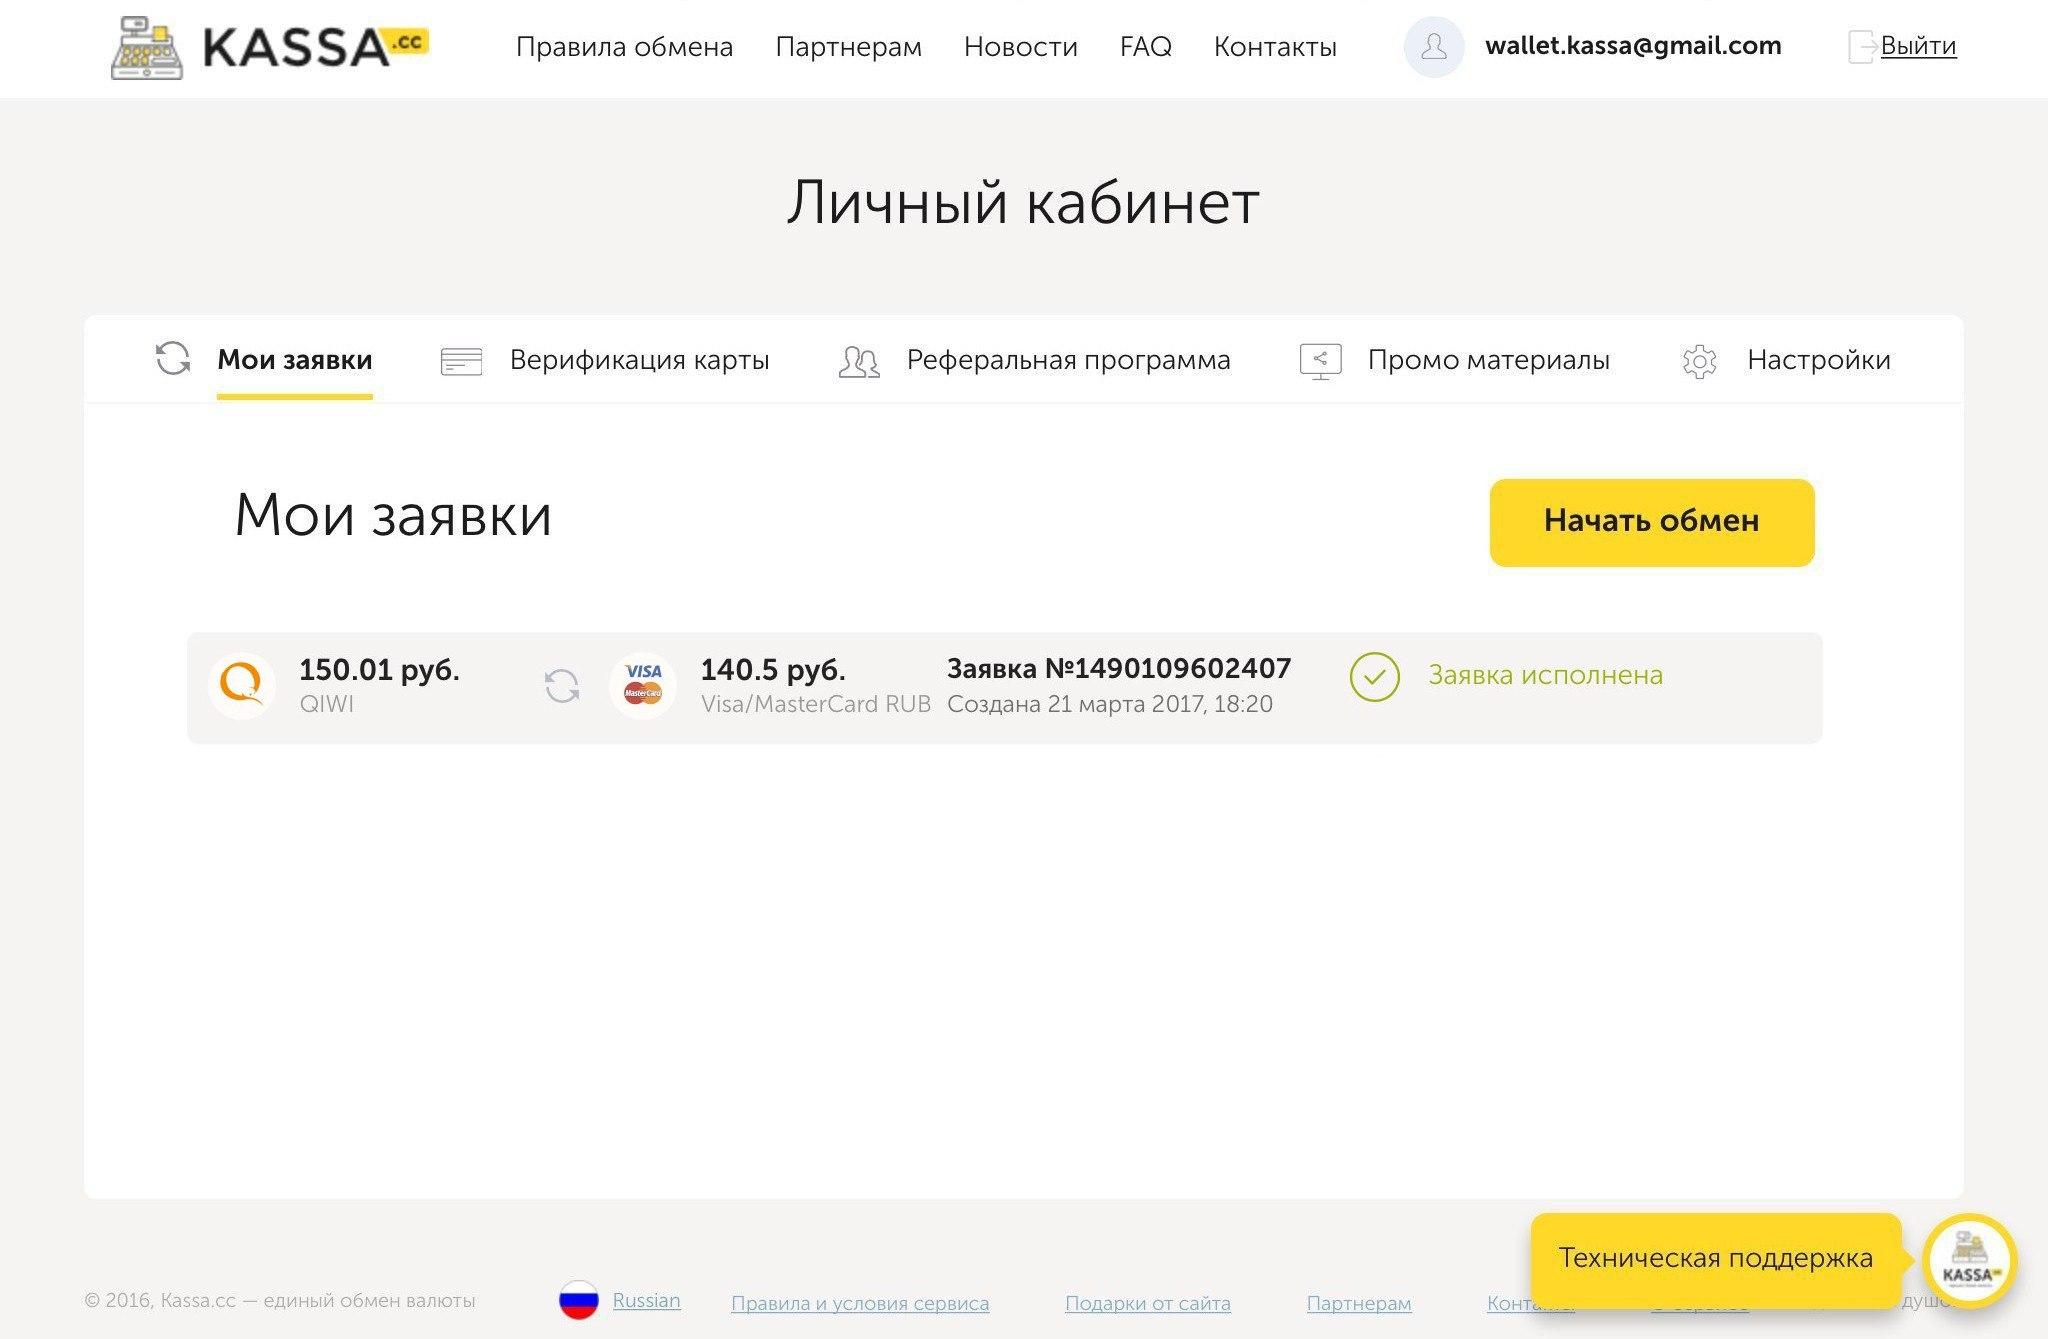 Kassa.cc - единый обмен валюты. Вывод QIWI RUB на карту Visa/MasterCard RUB